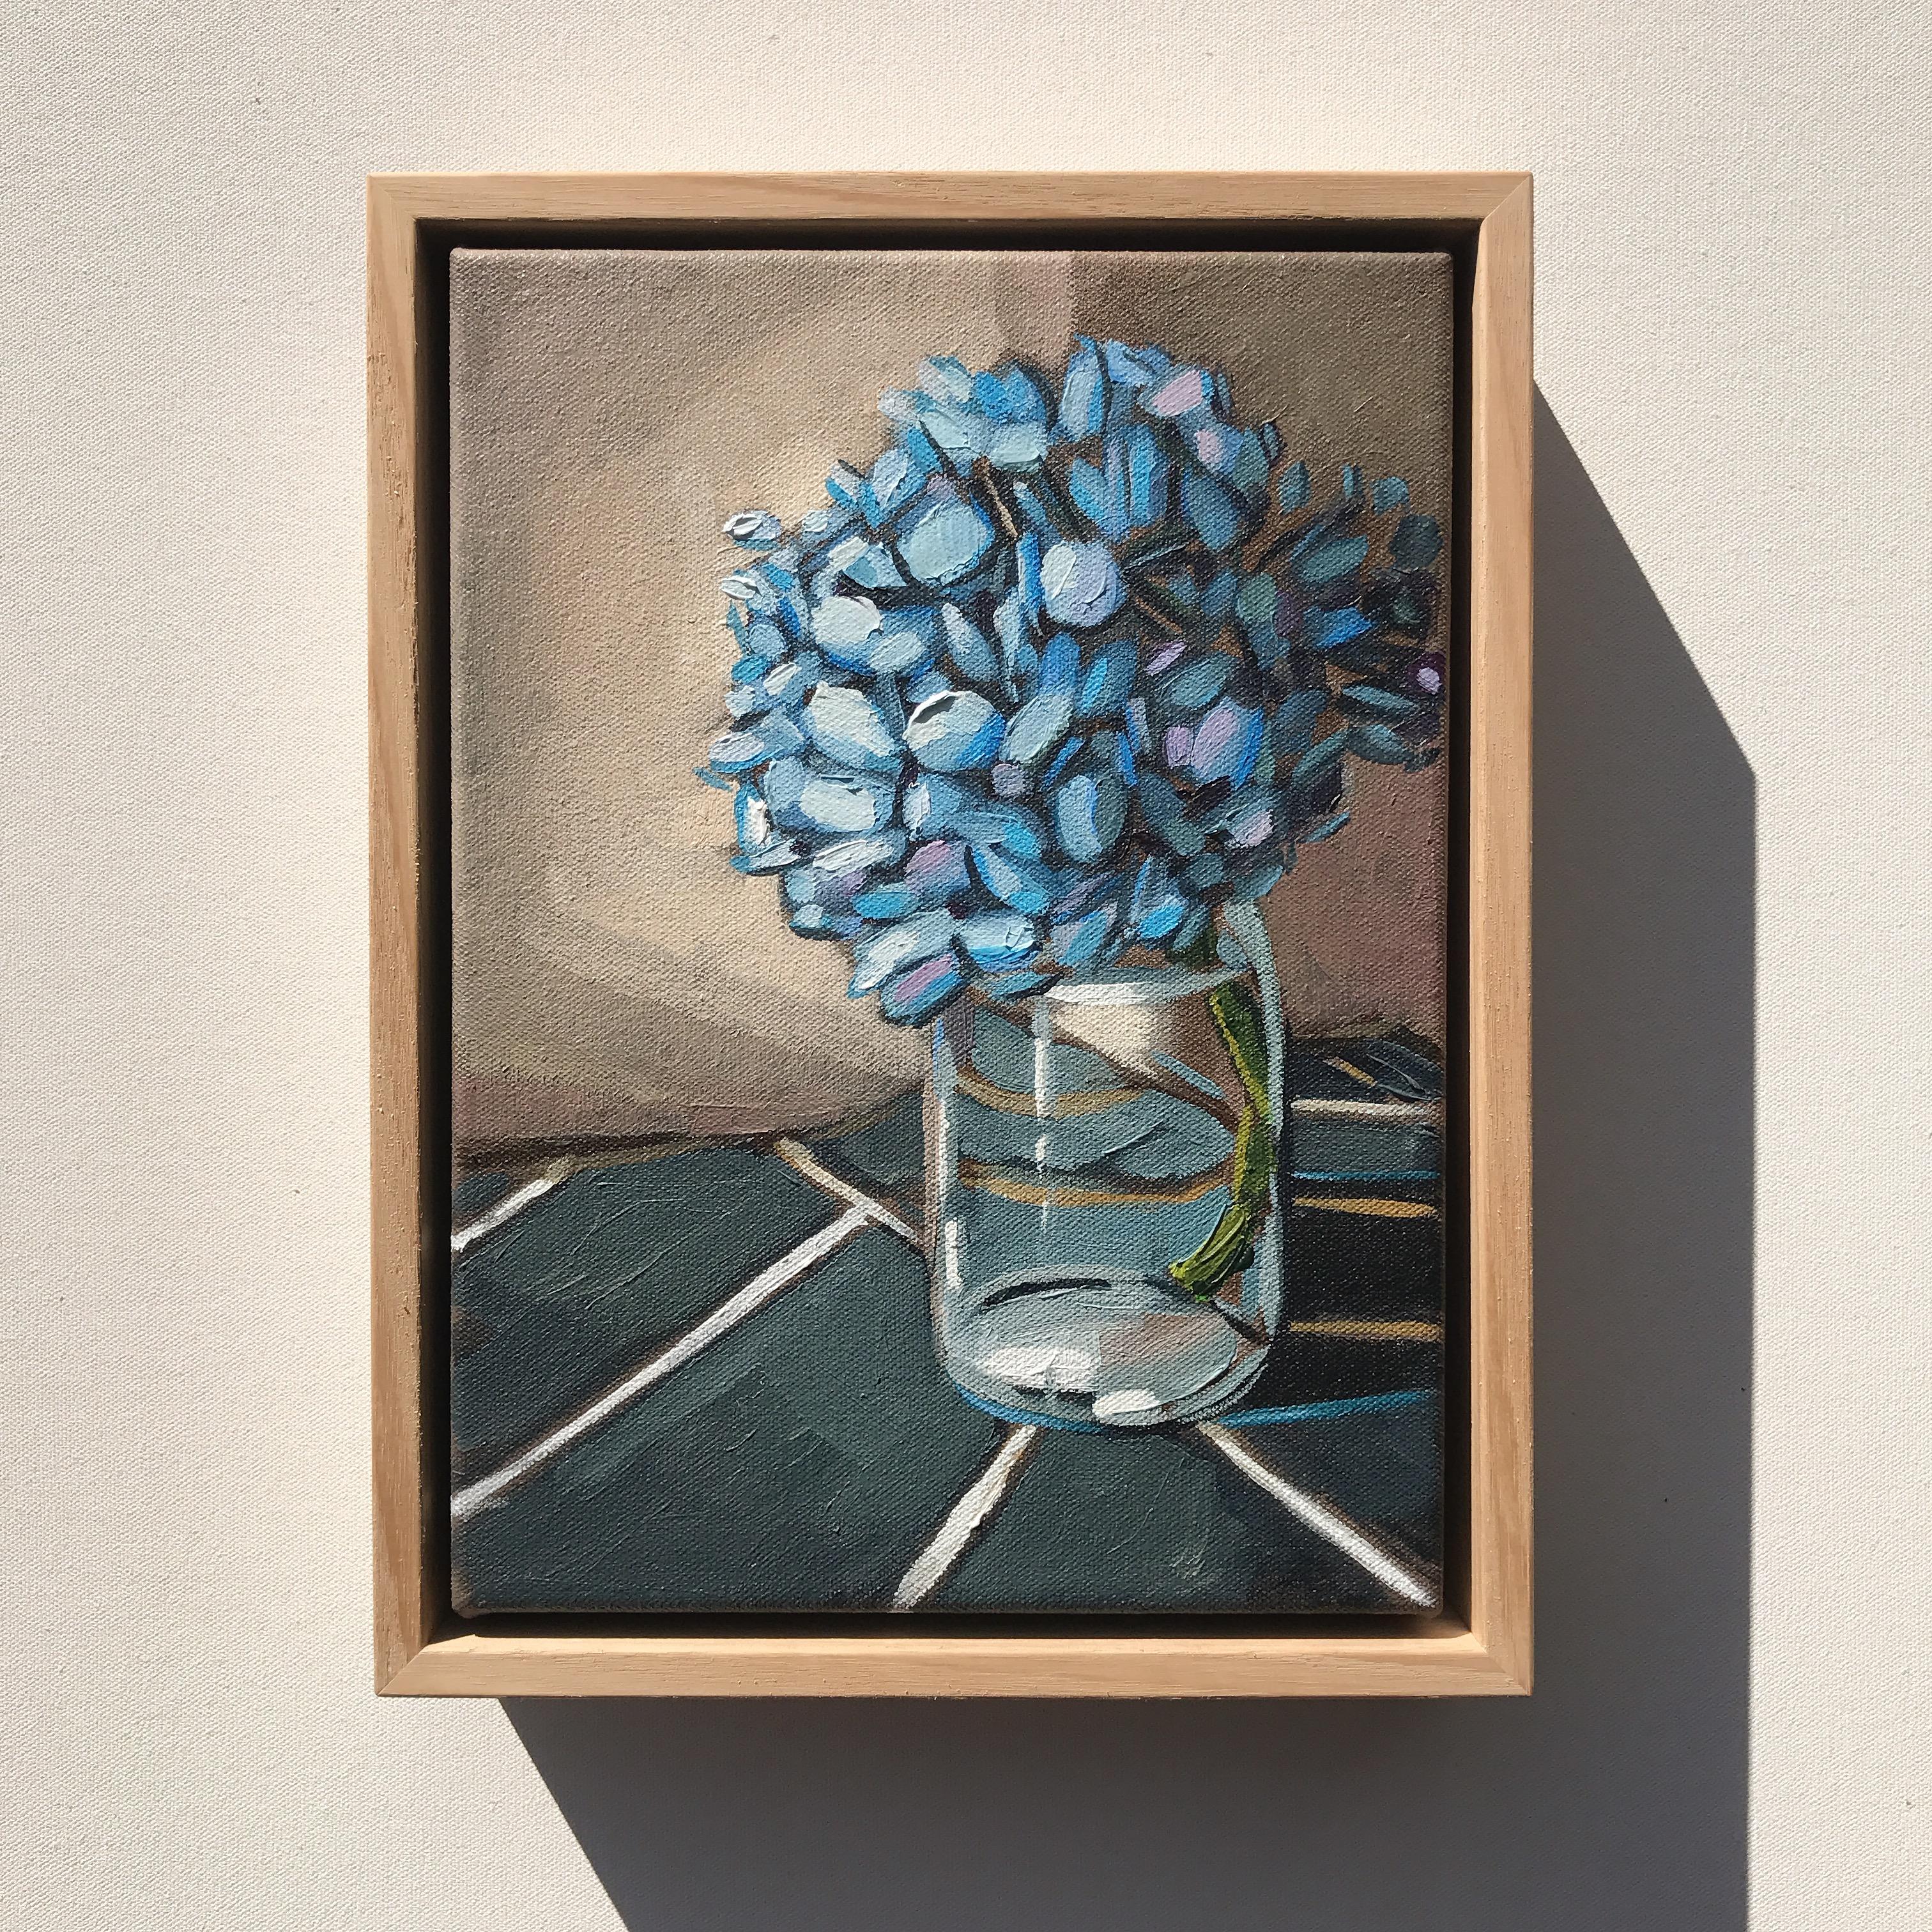 'Blue Hydrangeas' 29x22cm $495